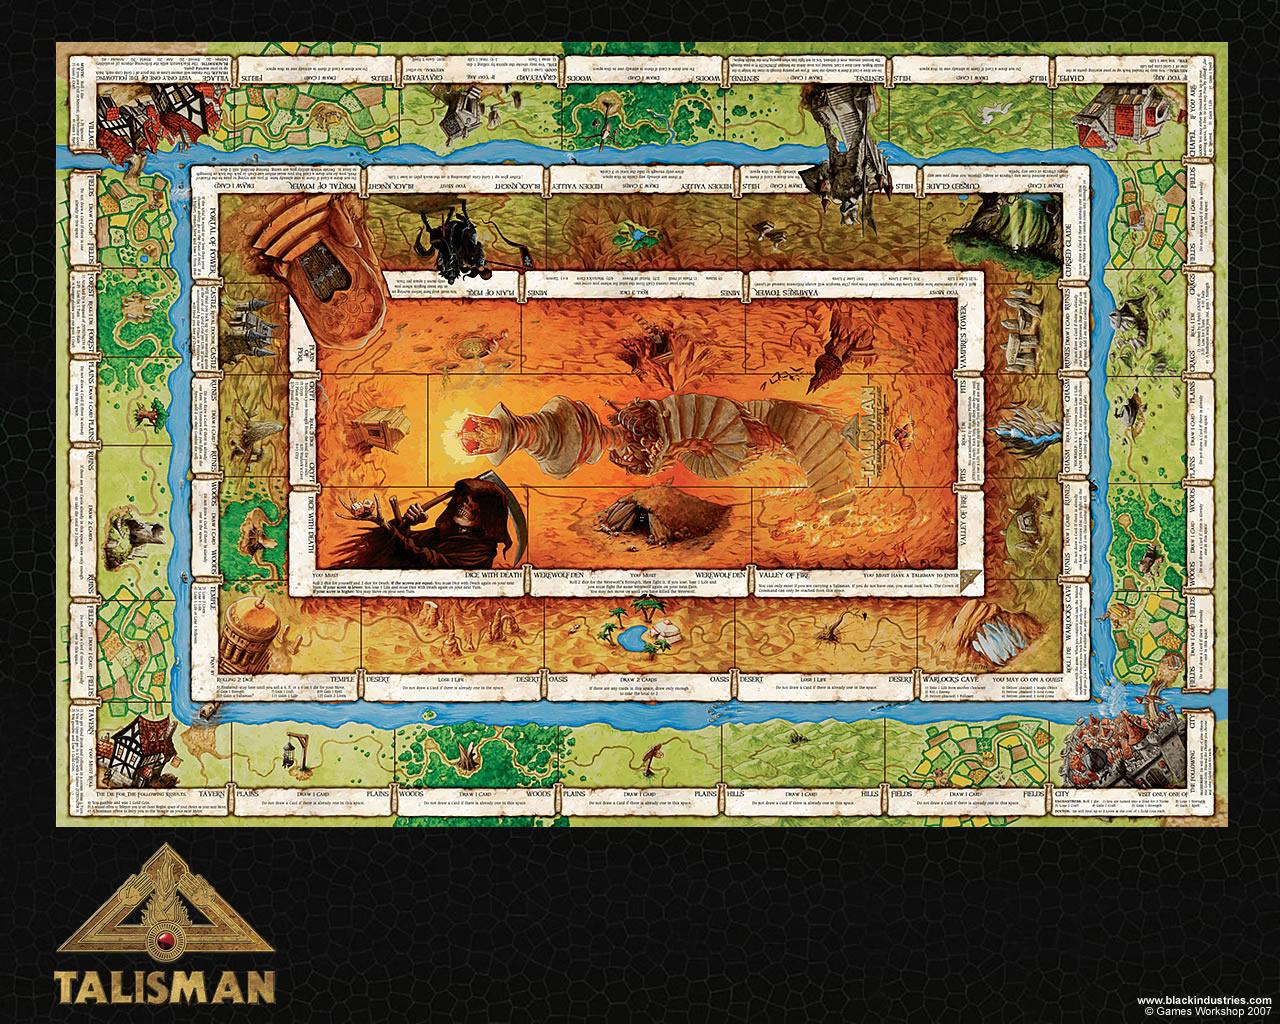 D20 musings talisman 4th edition - Talisman gioco da tavolo ...